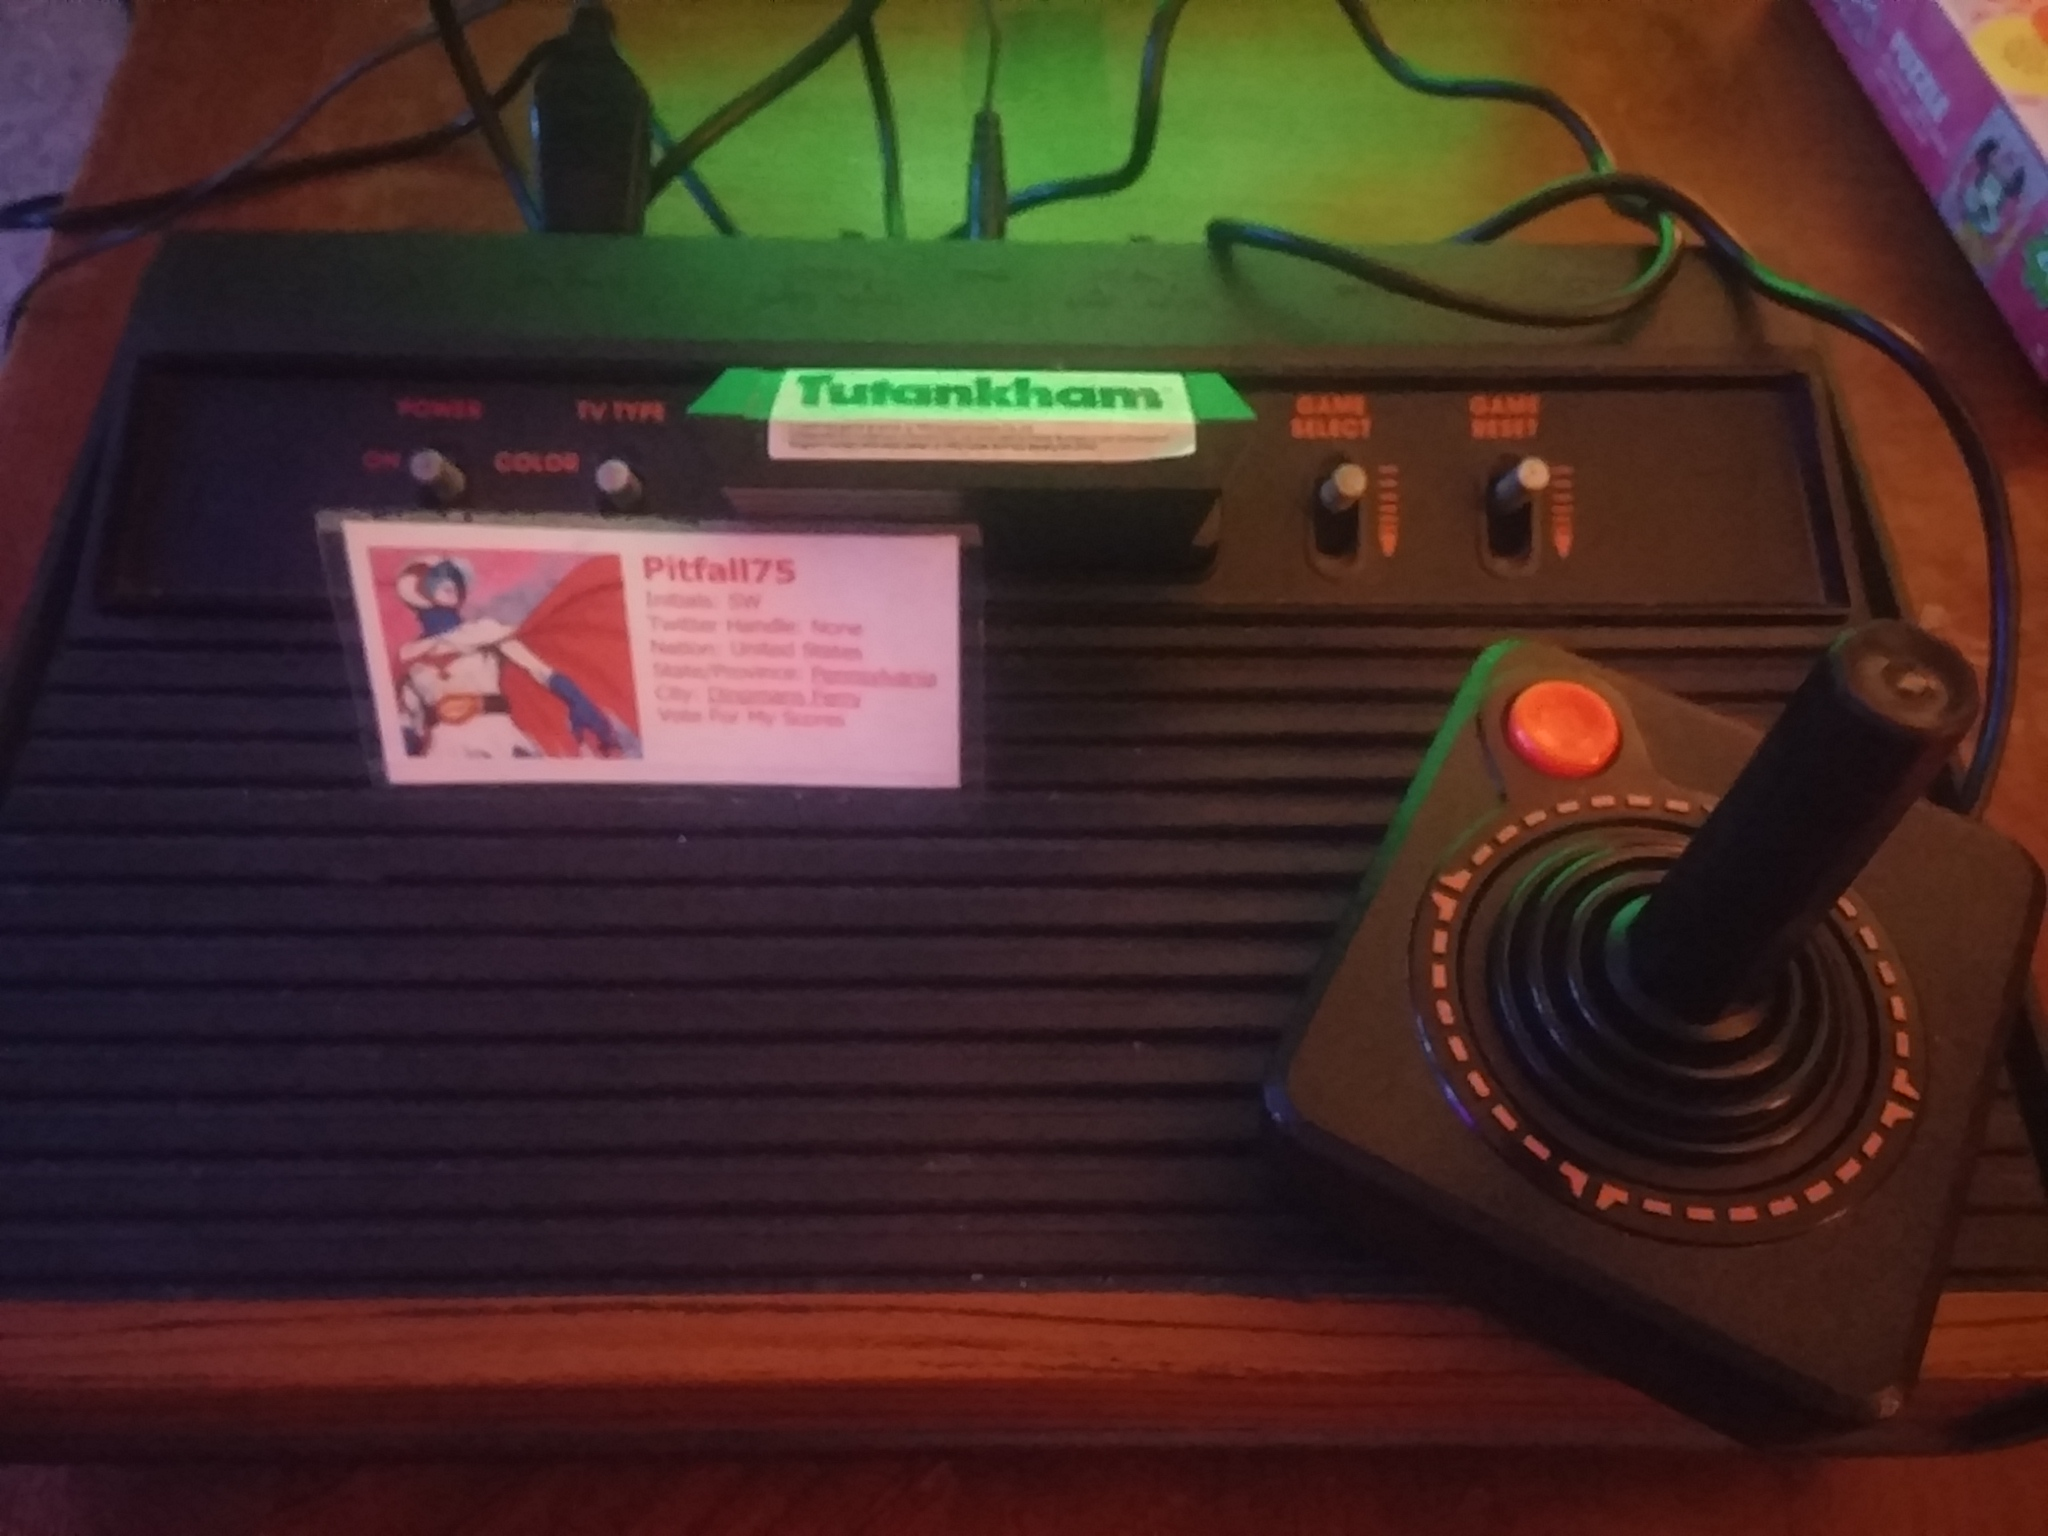 Pitfall75: Tutankham (Atari 2600) 635 points on 2018-01-26 21:42:10